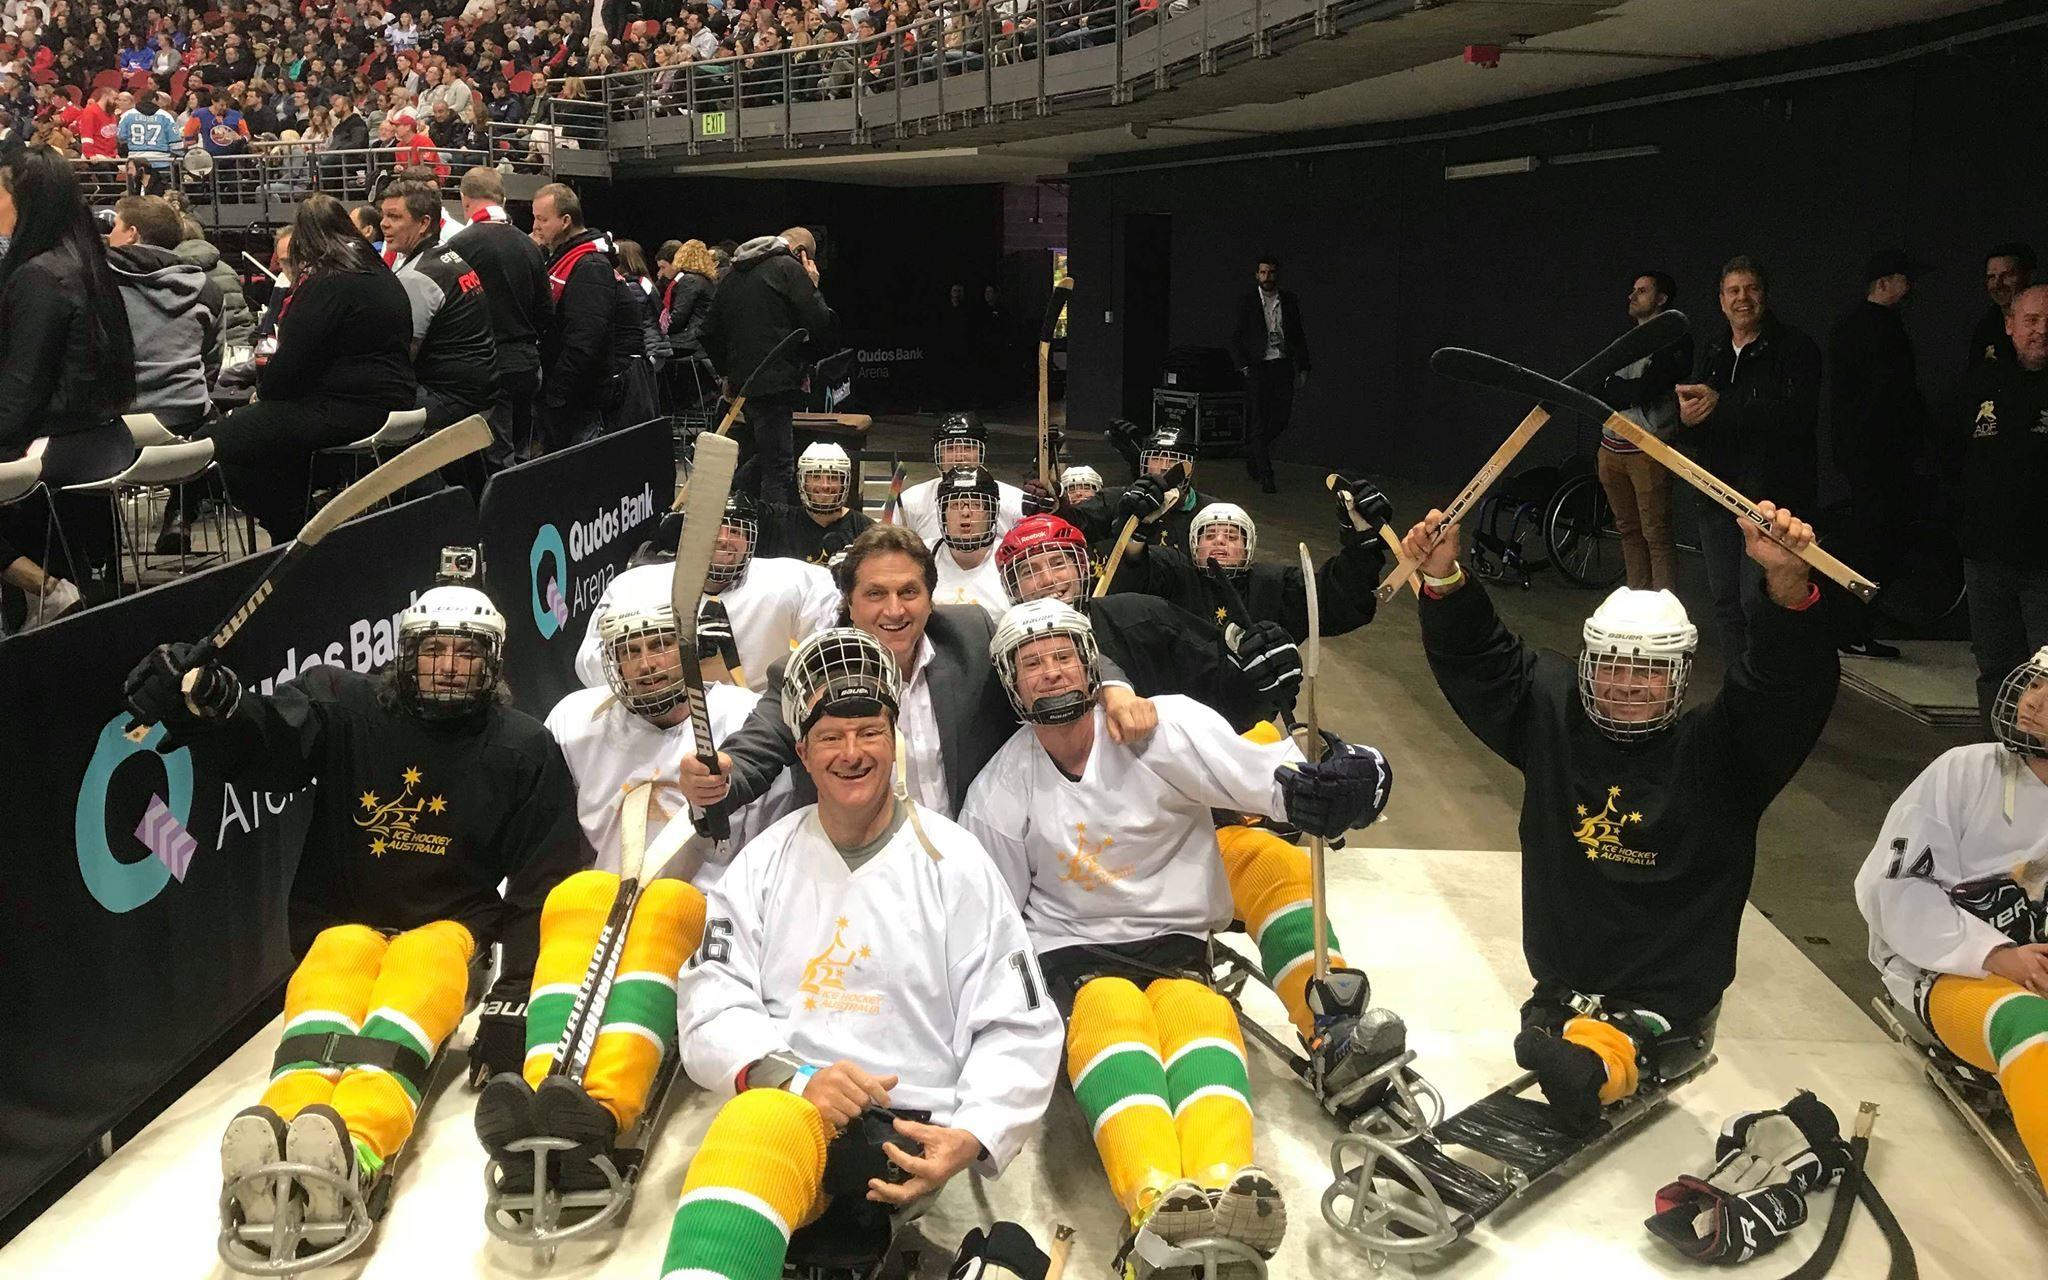 Para-ice hockey stars put on a show in Sydney